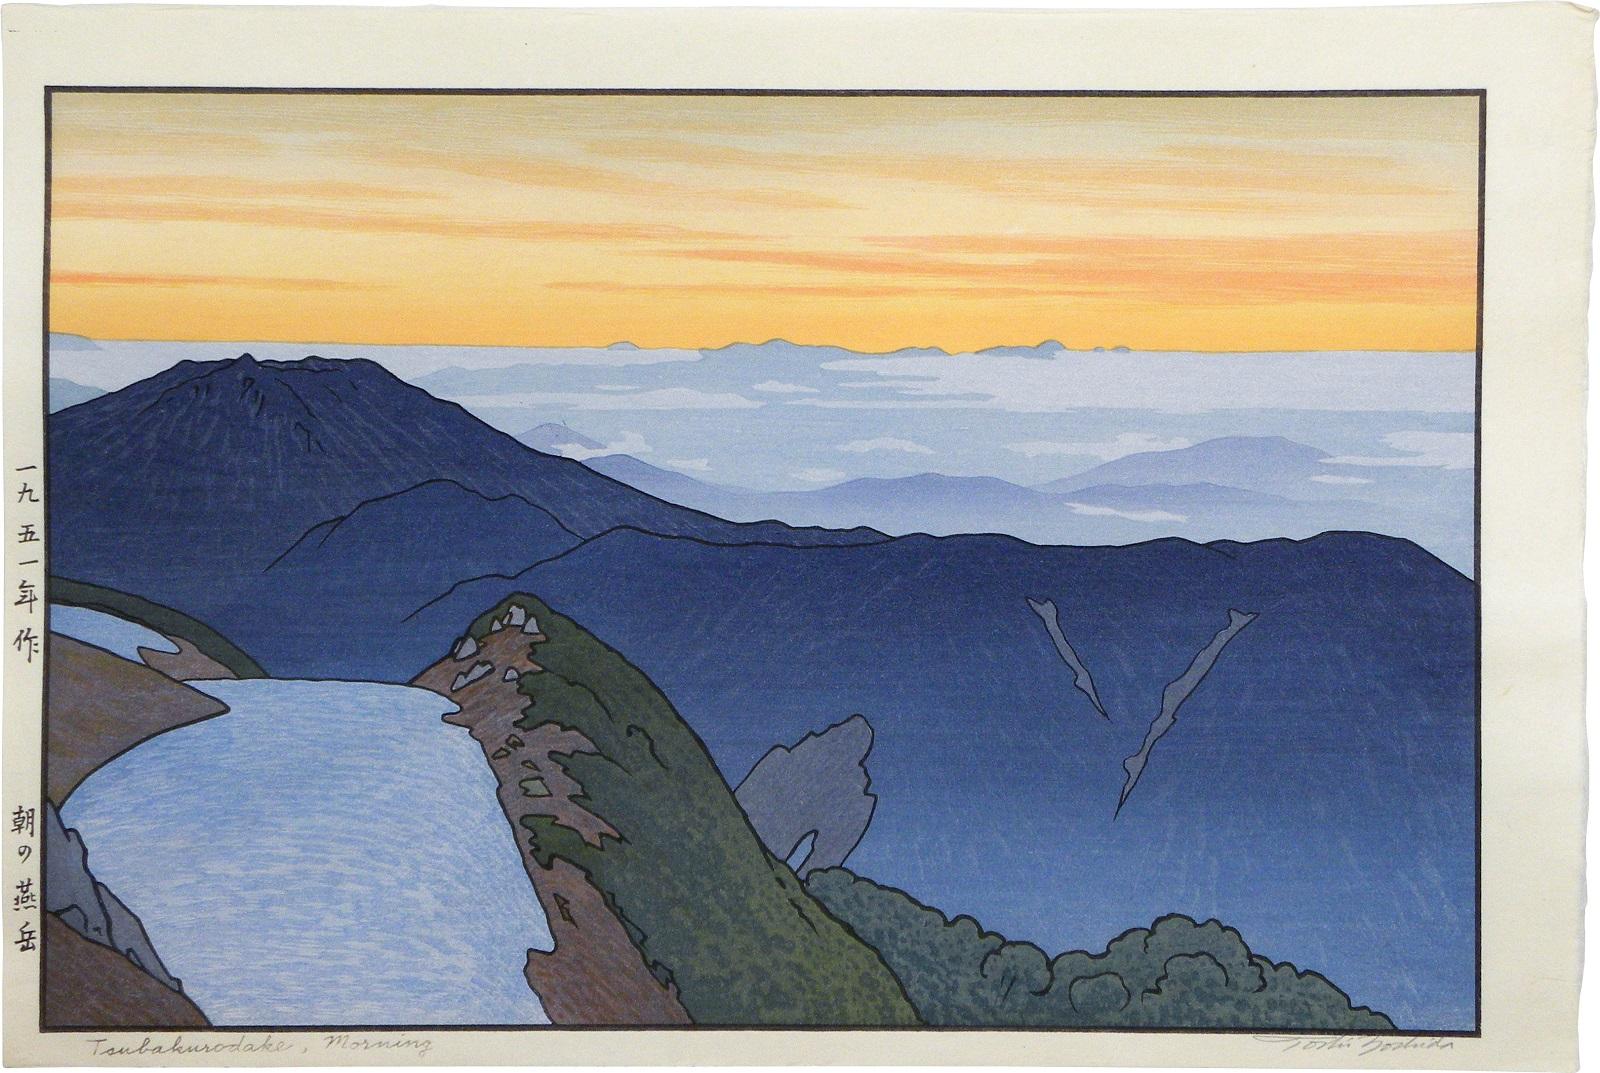 Tsubakurodake, Morning by Toshi Yoshida